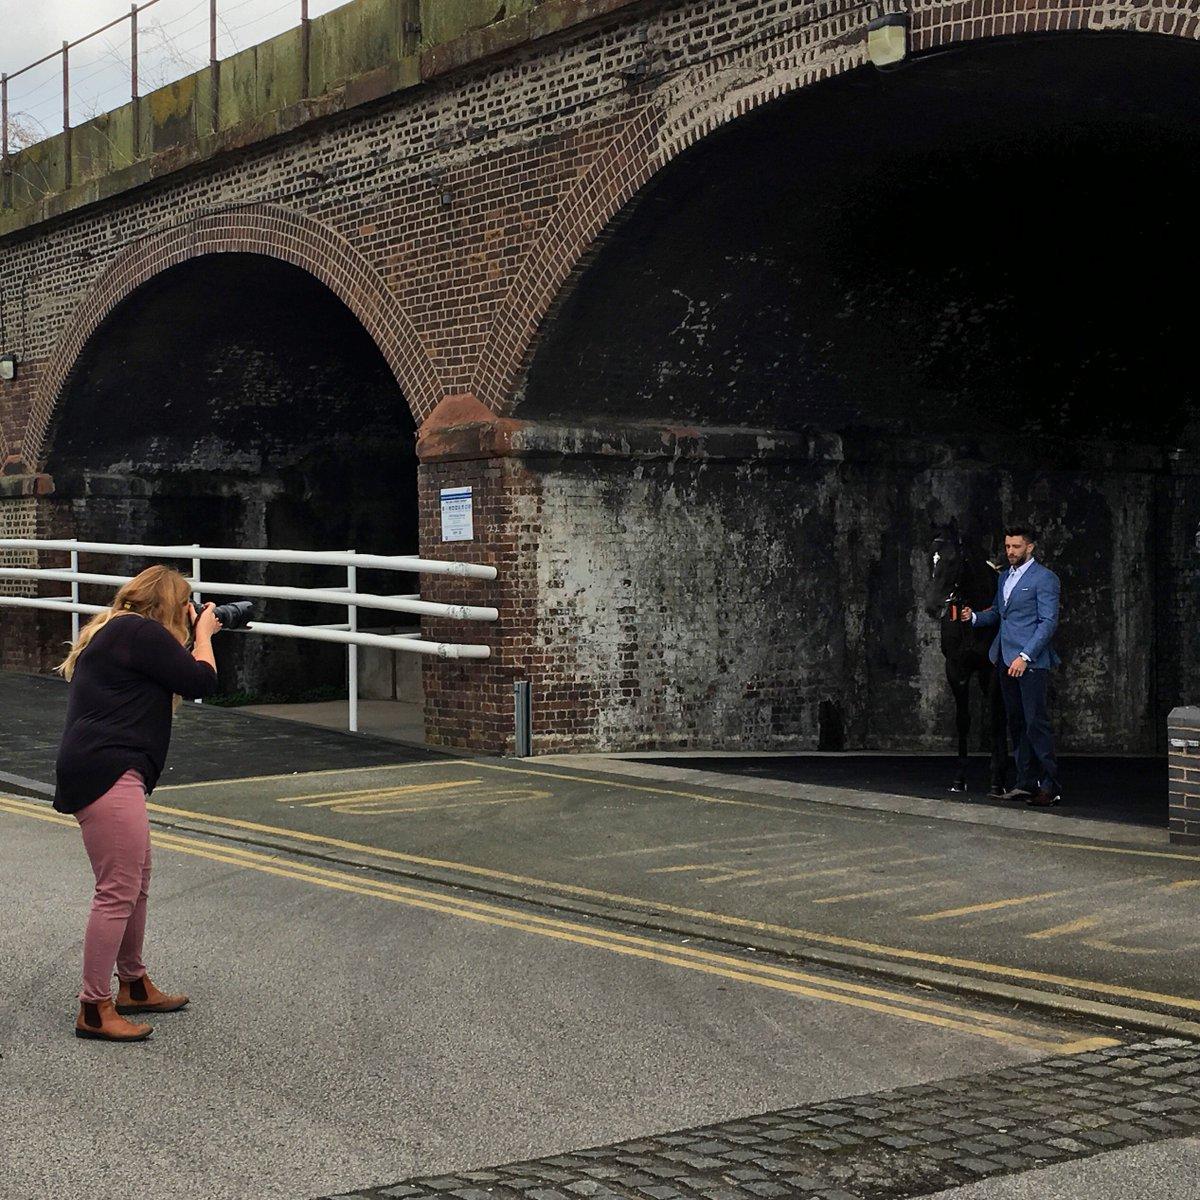 A sneak peek behind the scenes on our #BoodlesMayFest style partners shoot #ChesterRaces https://t.co/ZW2rfki2cc